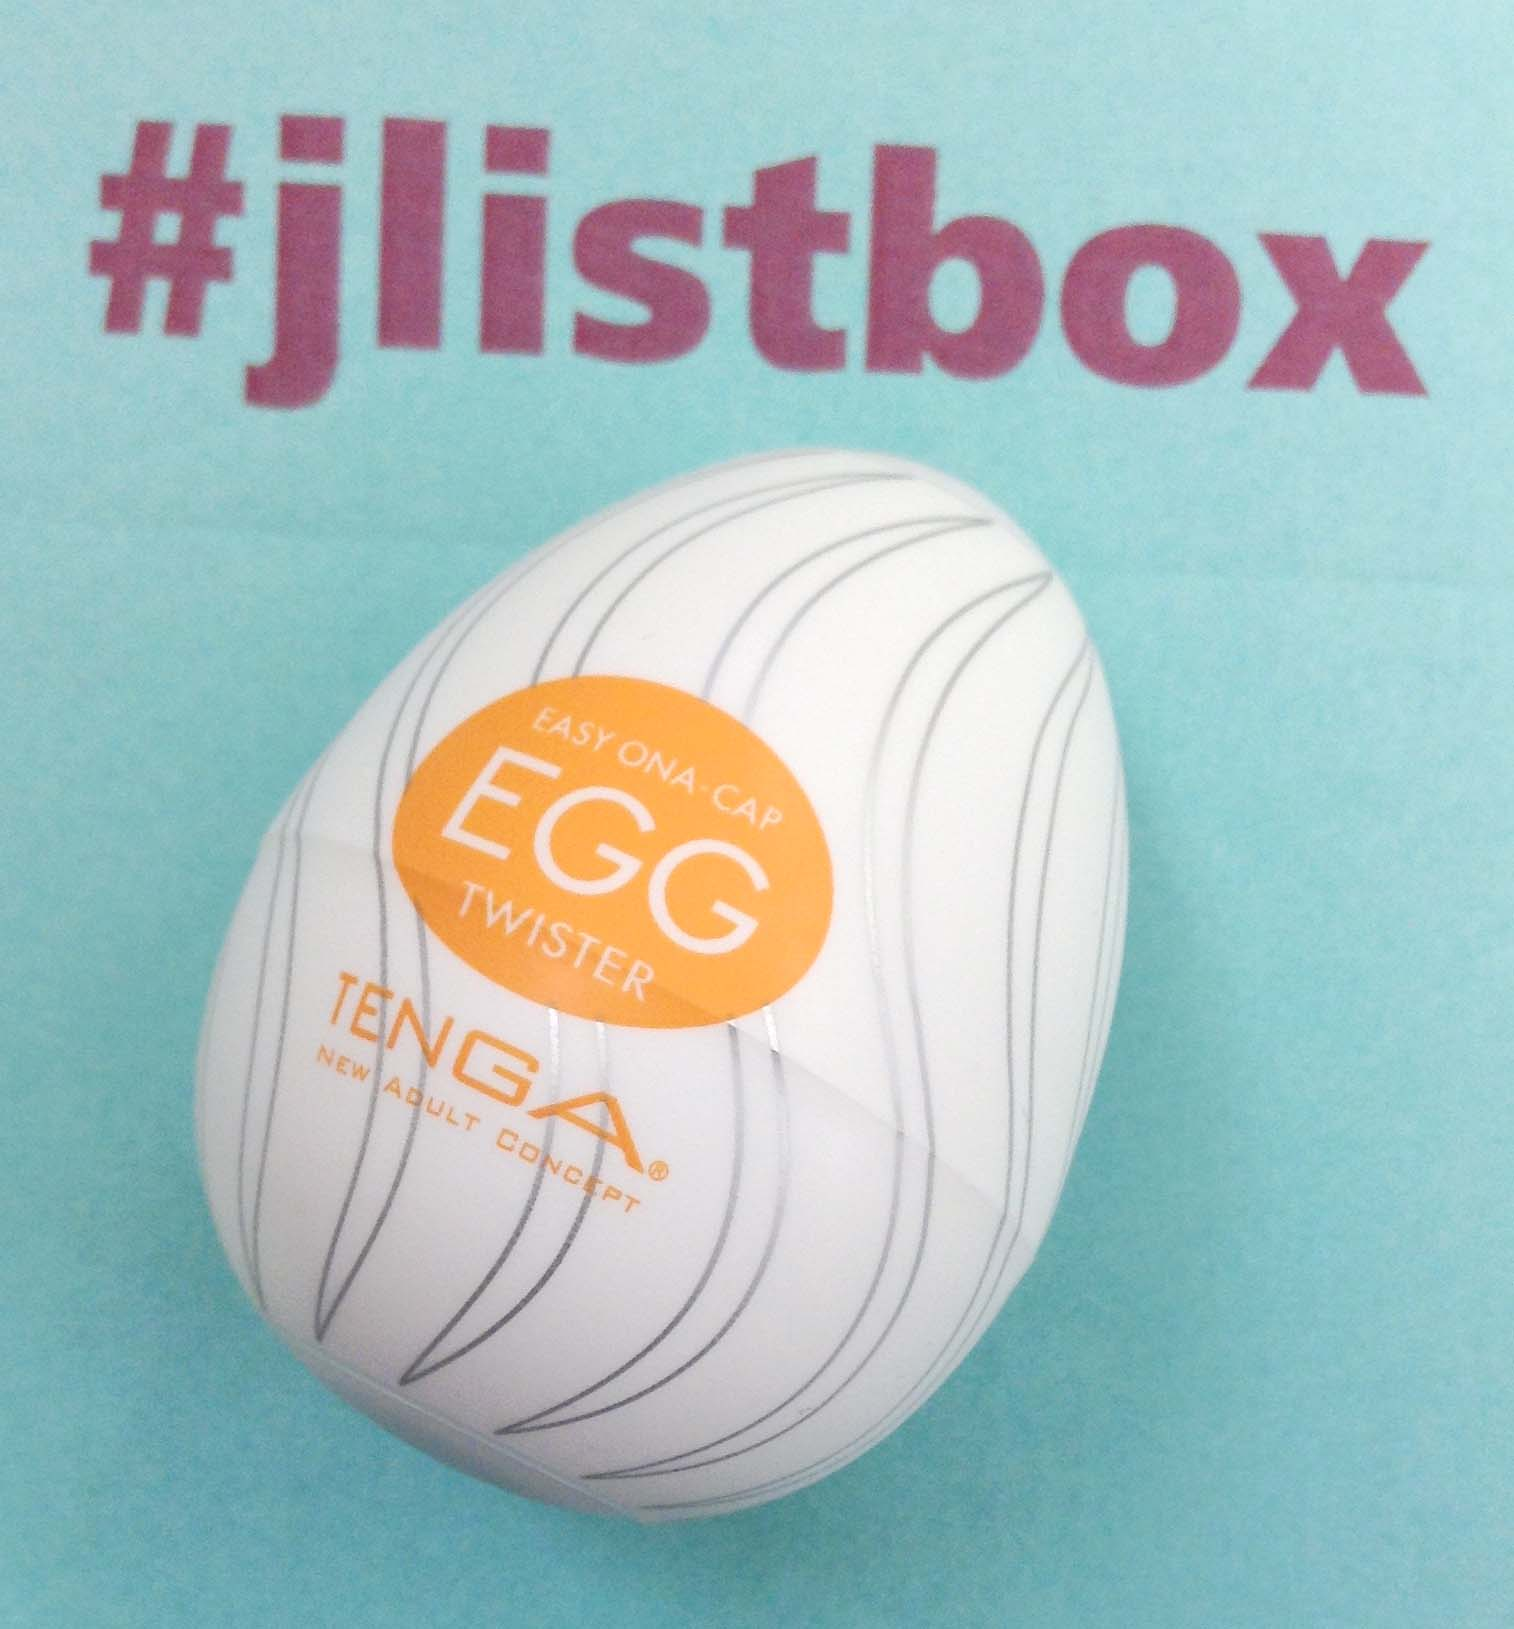 j-list-box-adult-january-edition-0005